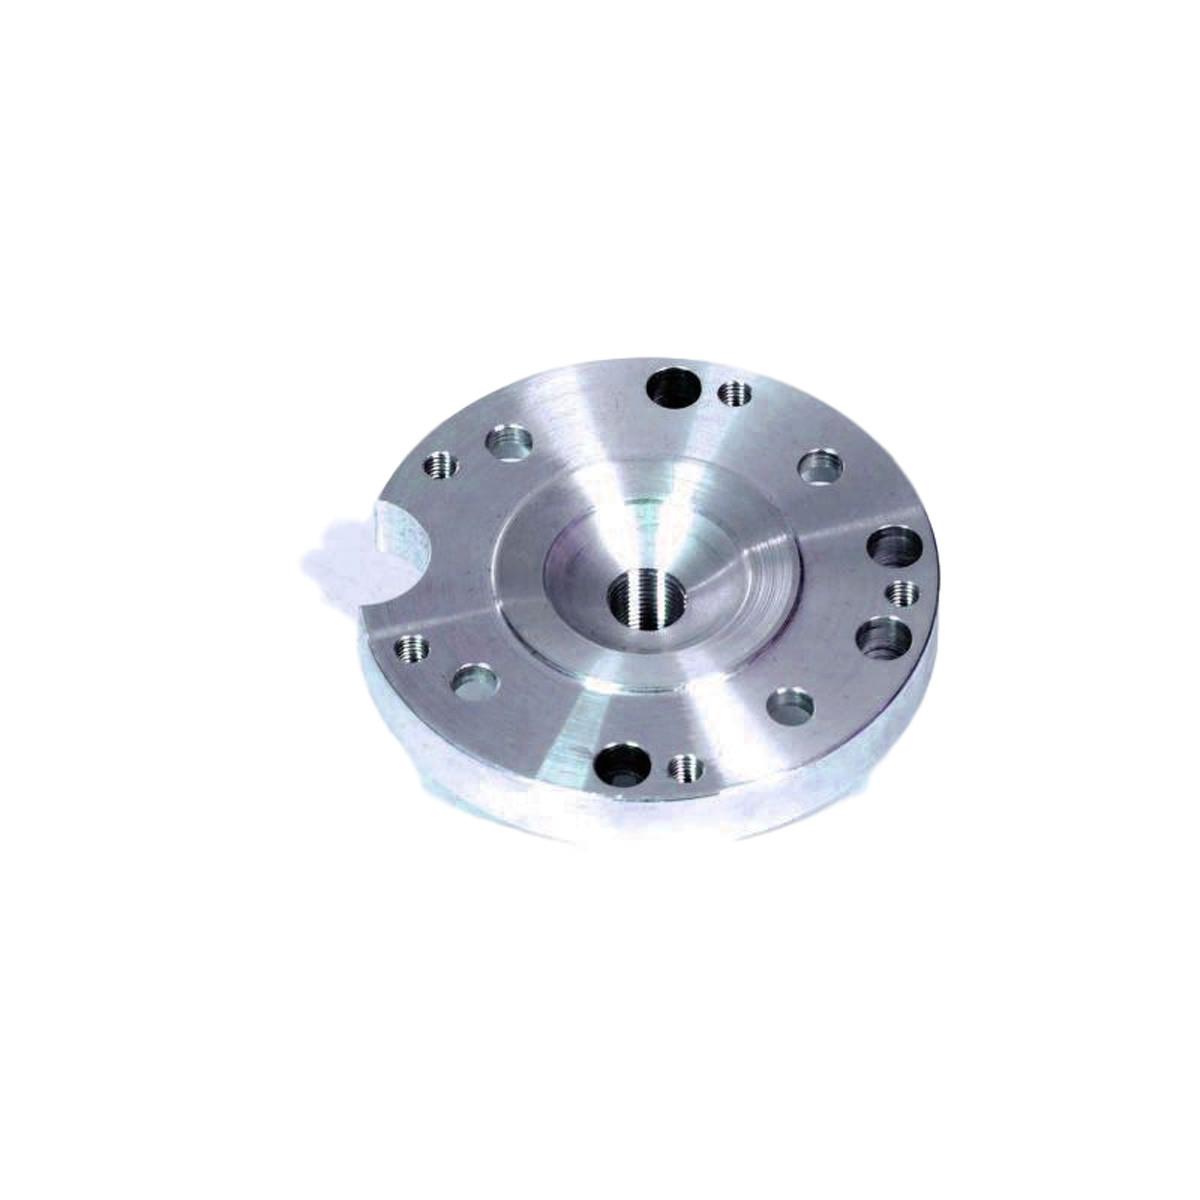 Plot de Culasse Nitro-Aerox 50mm - MVT